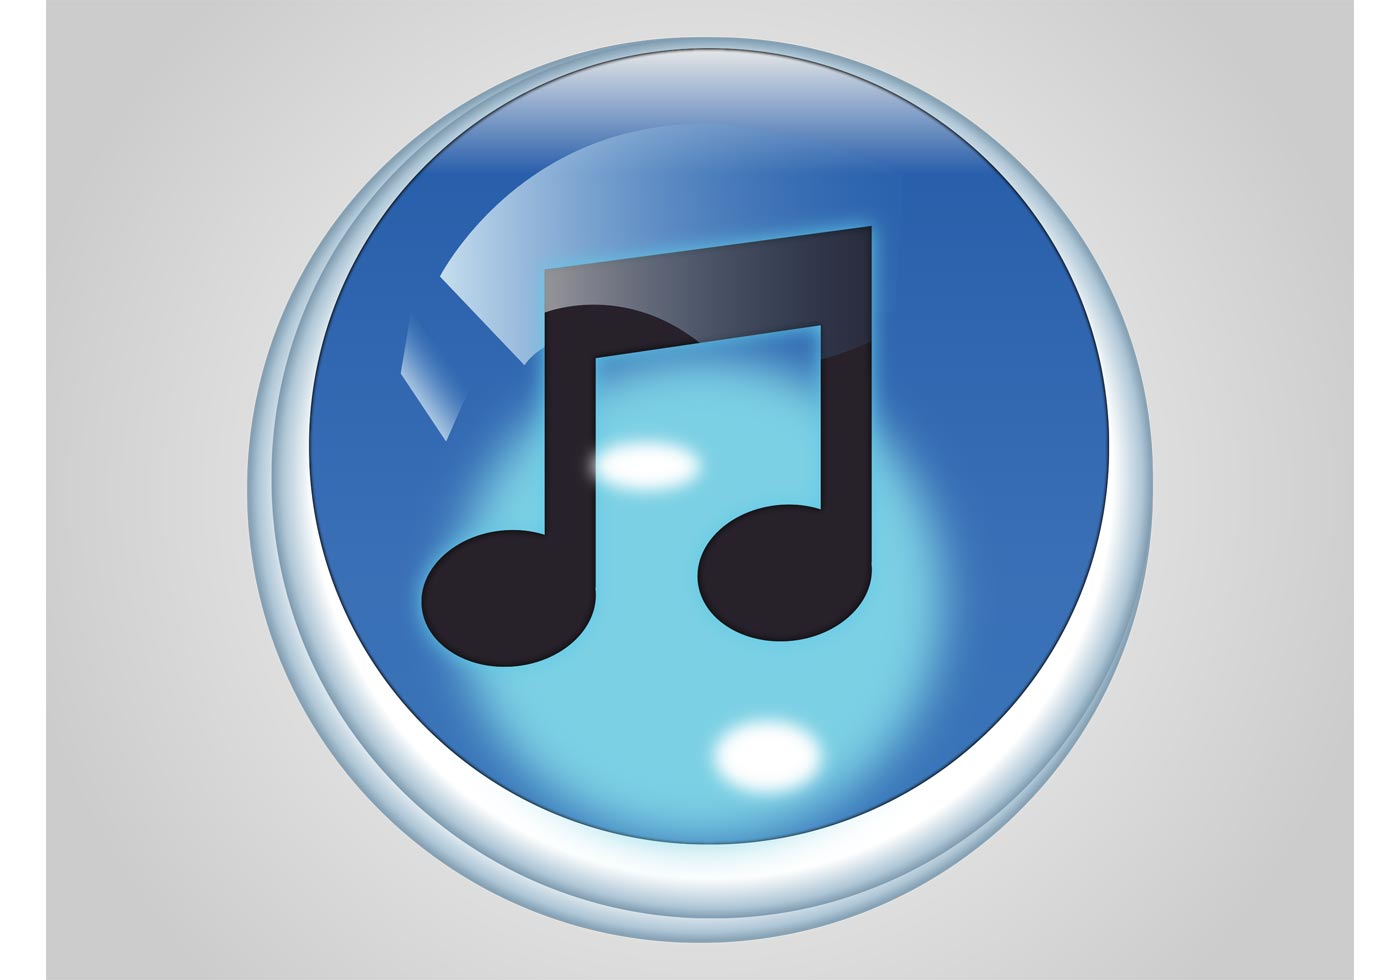 iTunes Icon 70534 Vector Art at Vecteezy